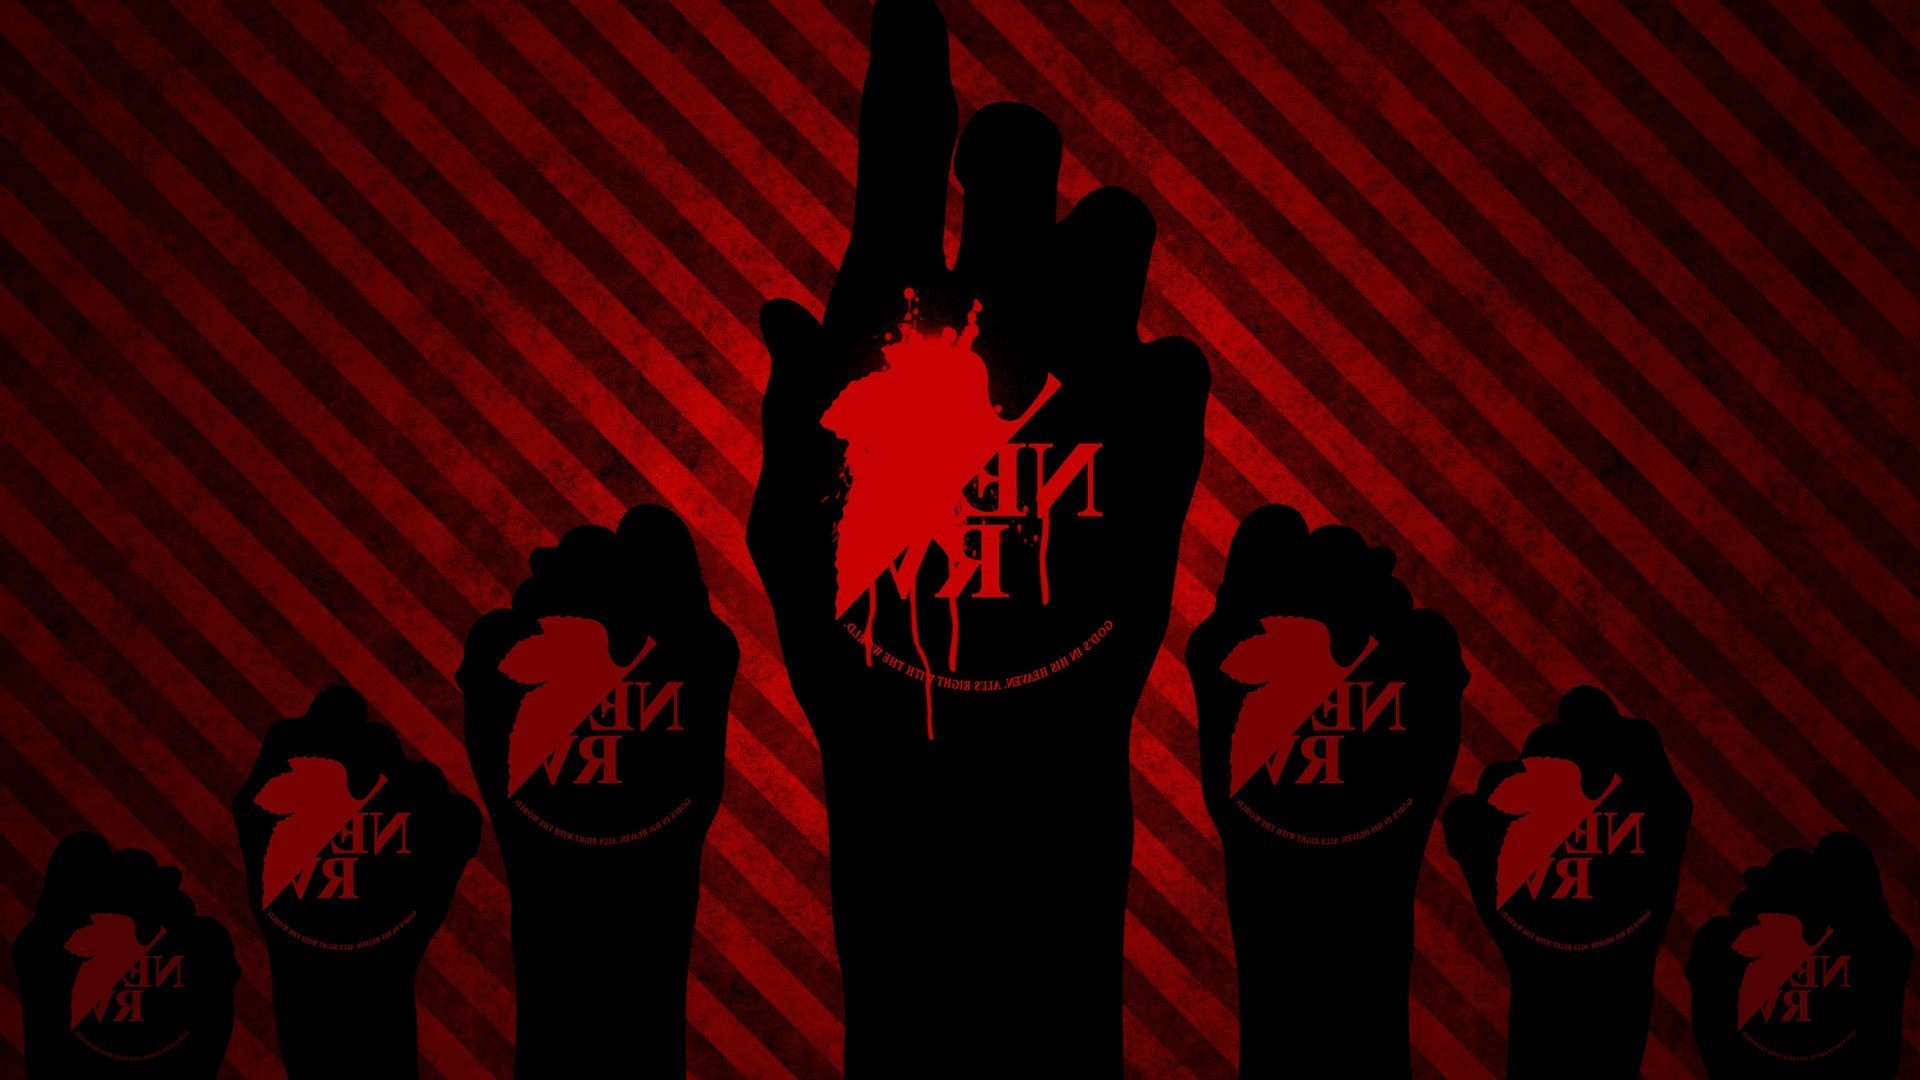 Red anime wallpaper 66 images - Anime wallpaper black background ...